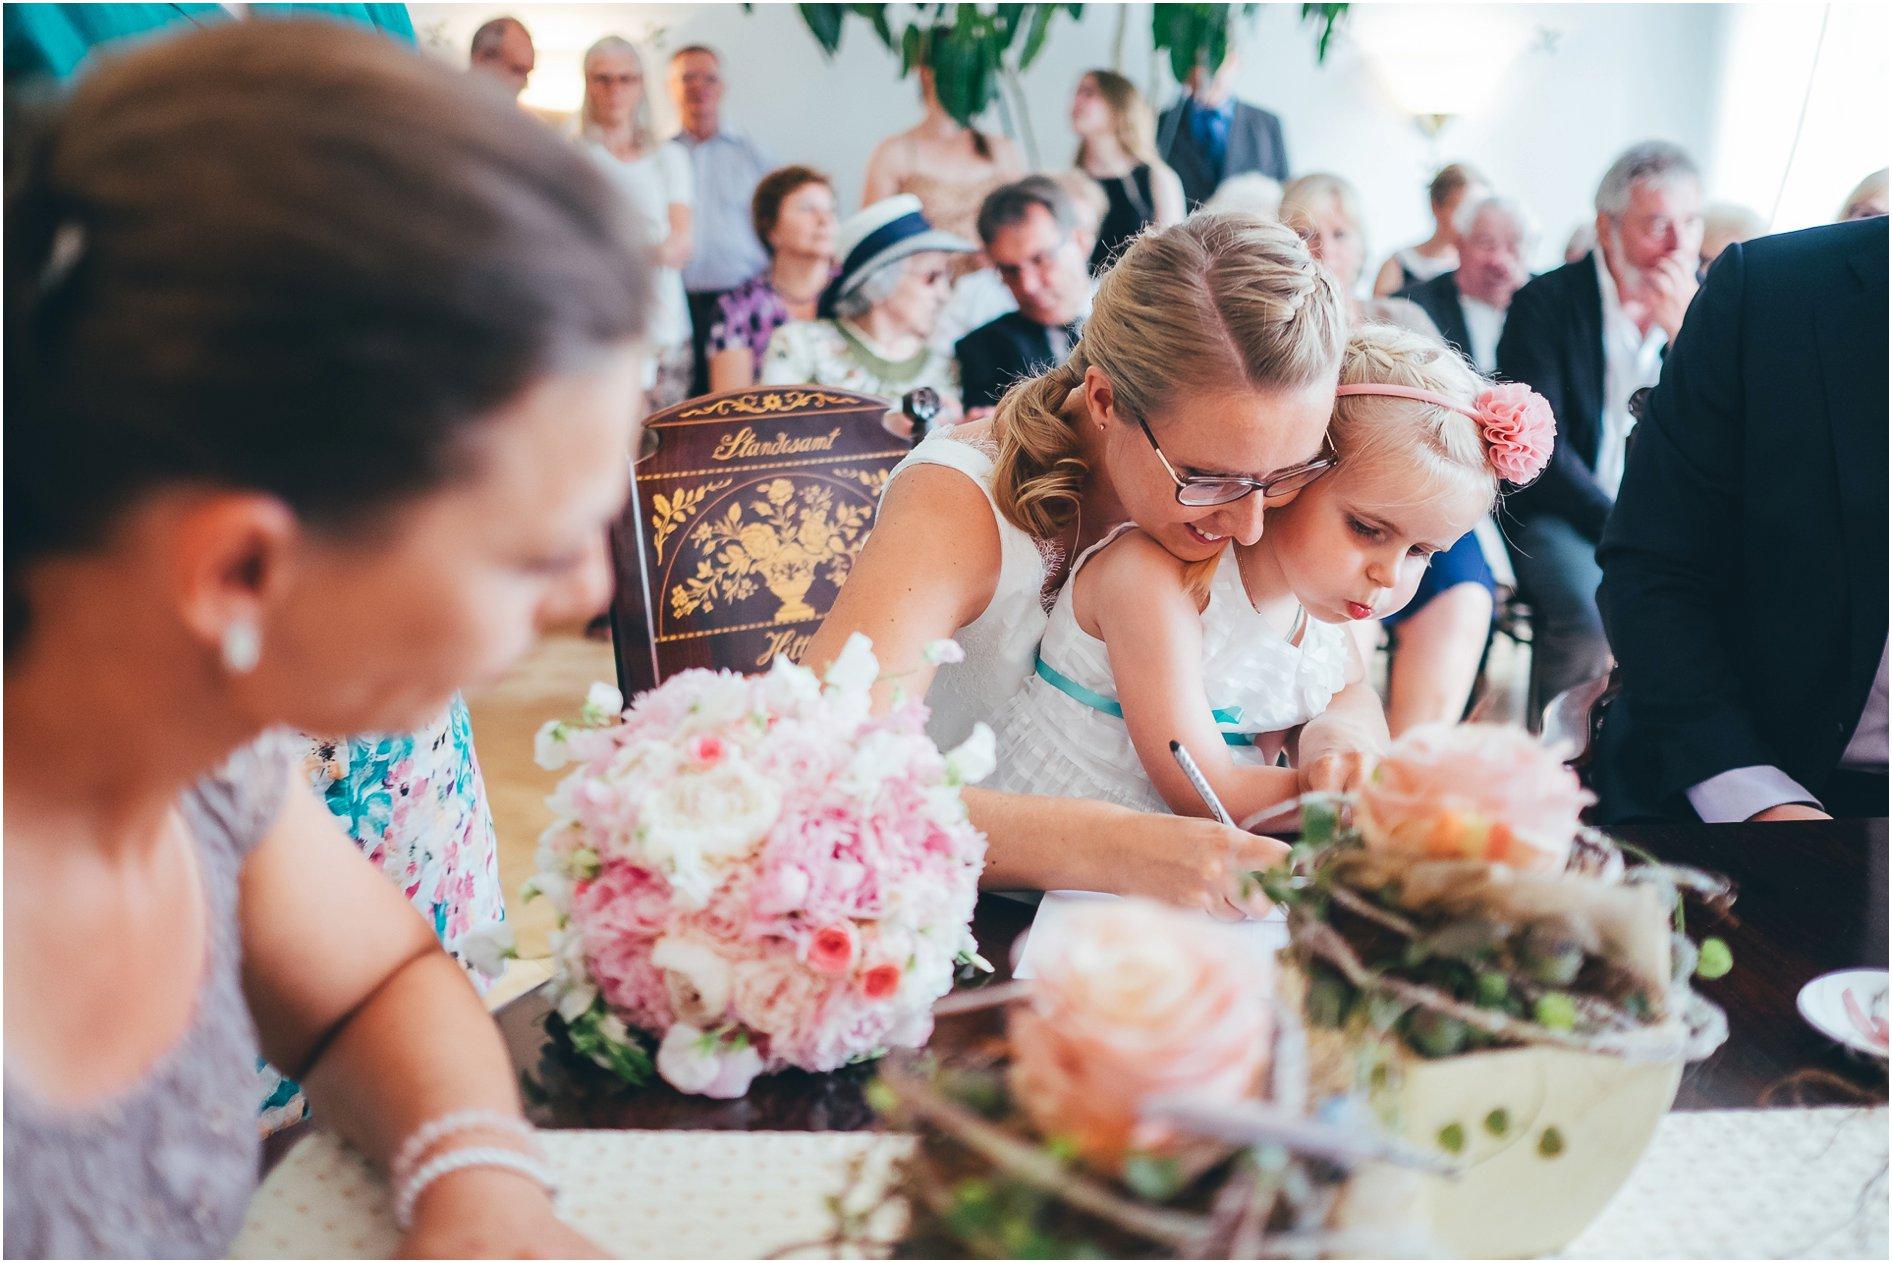 2016-04-19_0028 Sandra & Janis - Hochzeitsfotograf in Seevetal